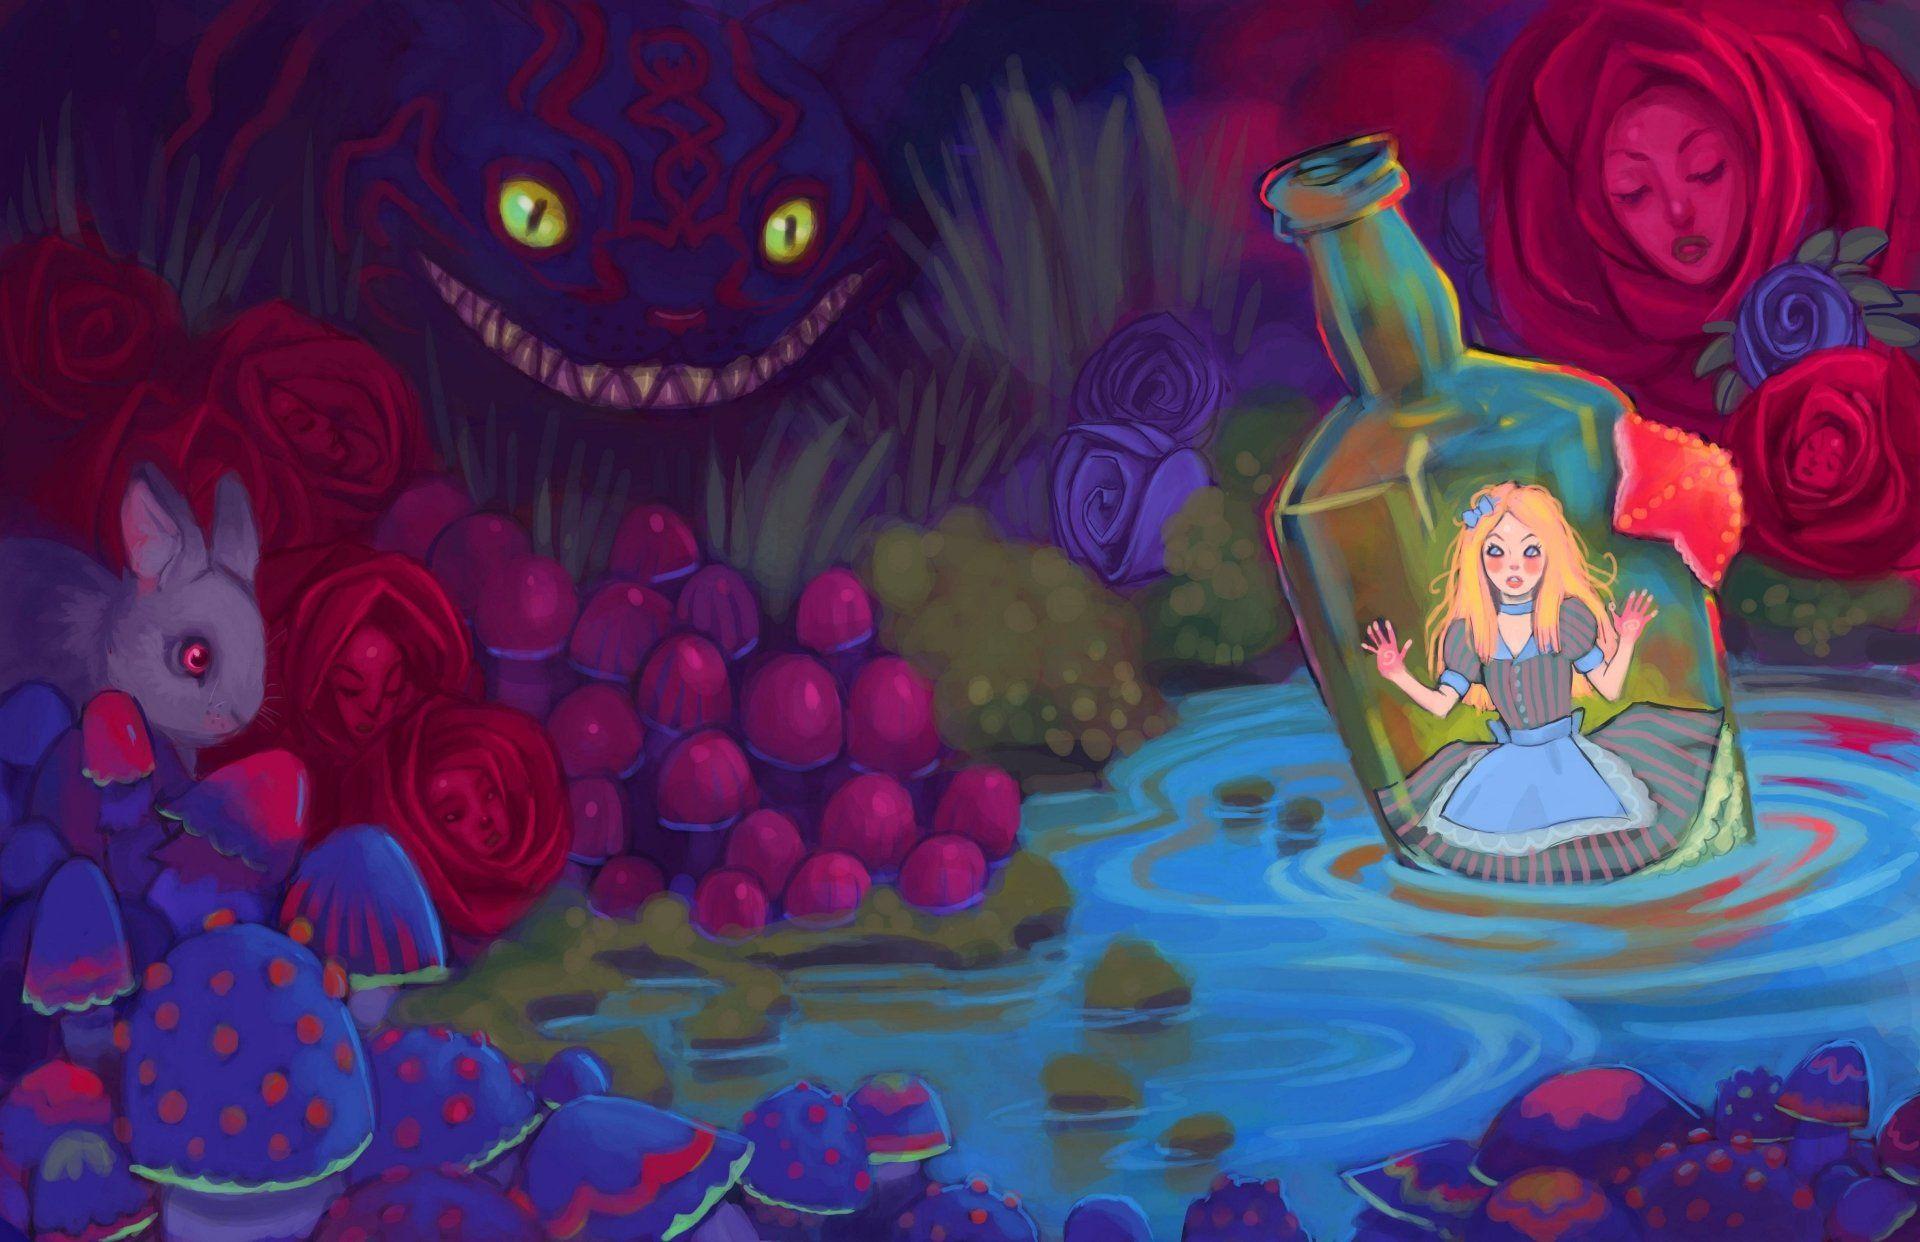 4080x2640 Alice In Wonderland Wallpaper Background Image View